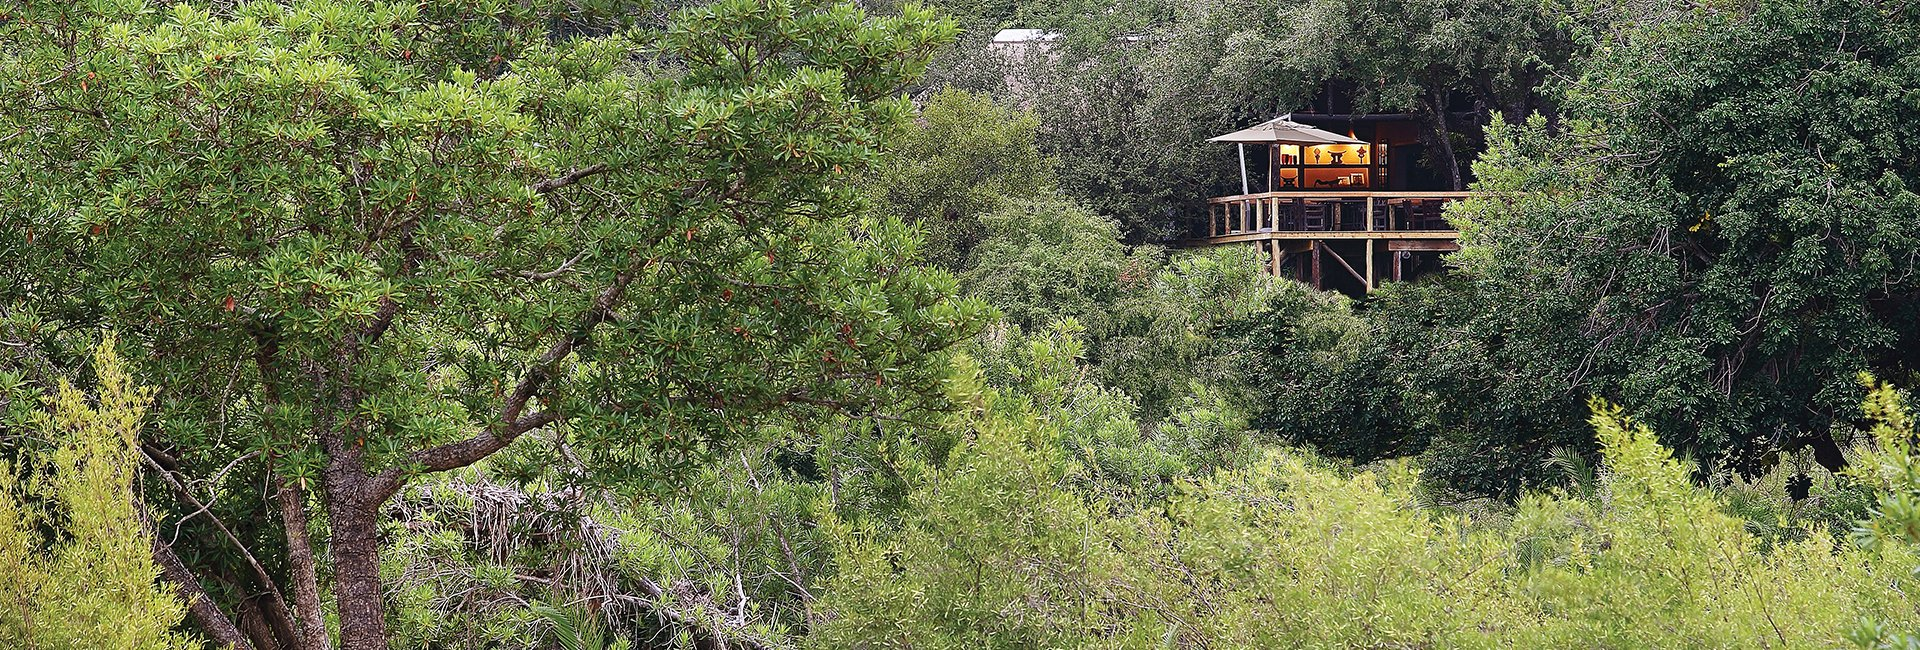 Londolozi Tree Camp Iconic Africa Luxury Safaris